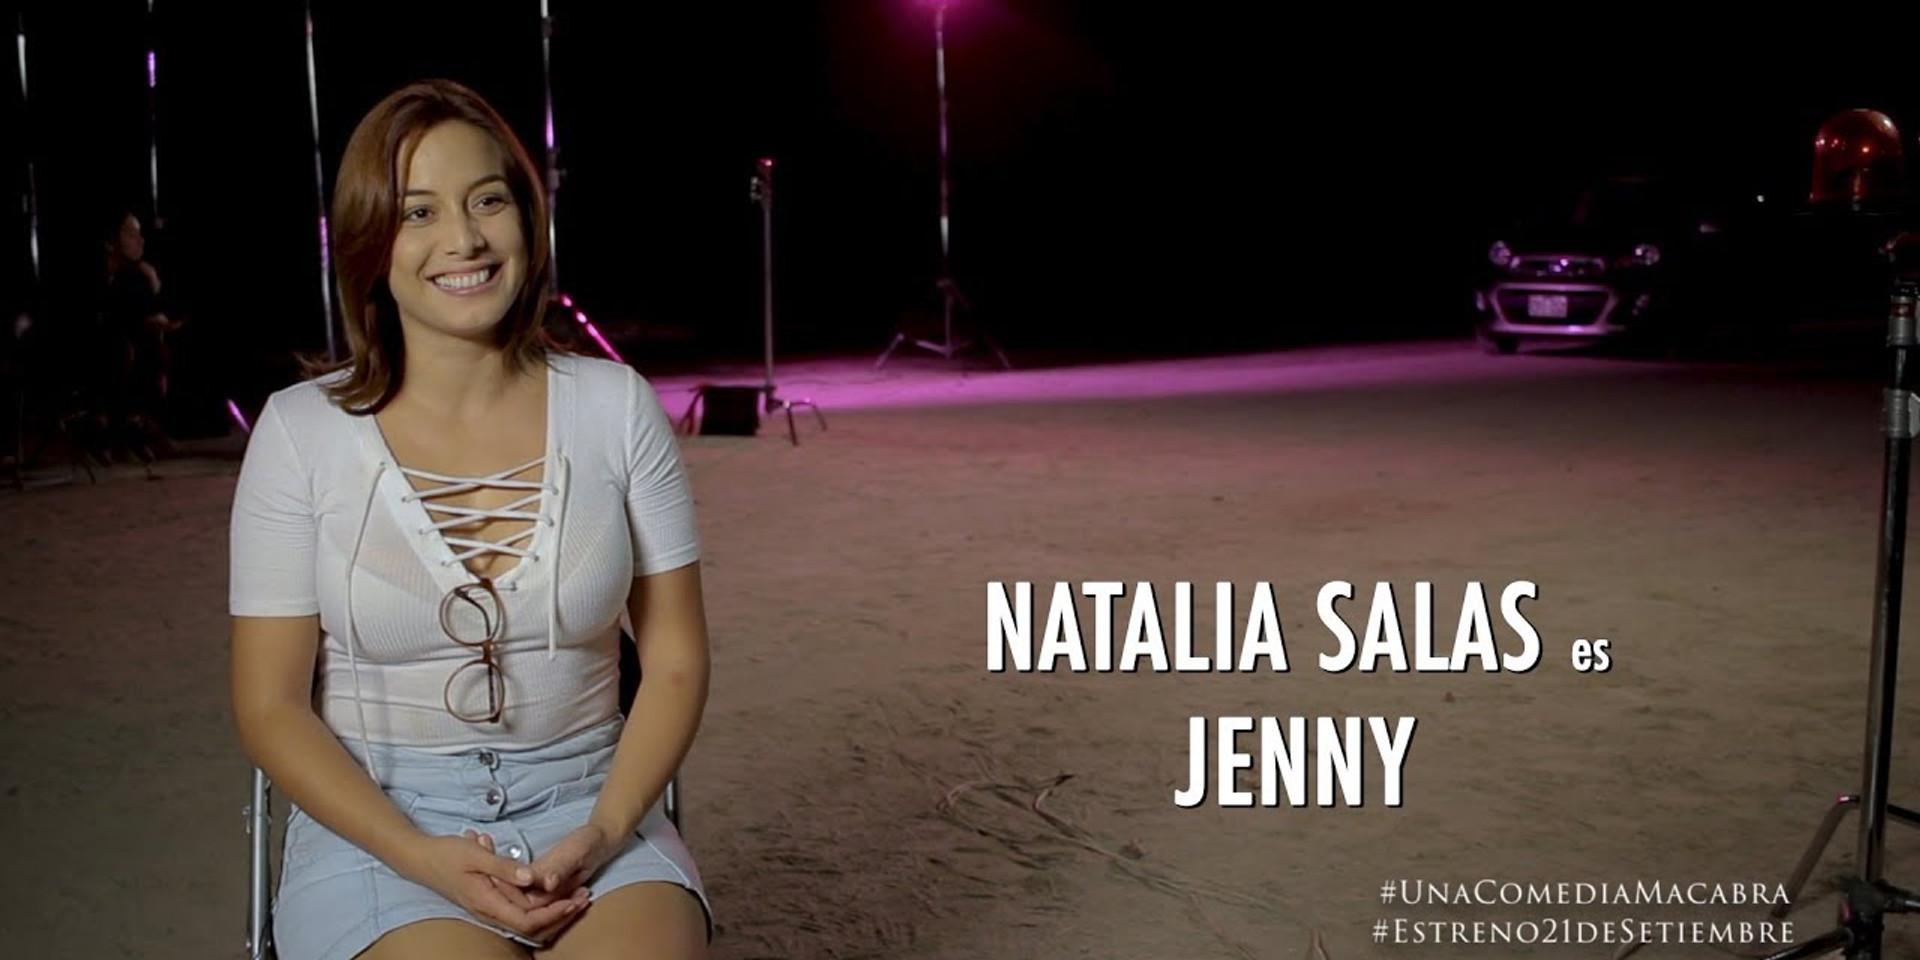 Natalia Salas es Jenny